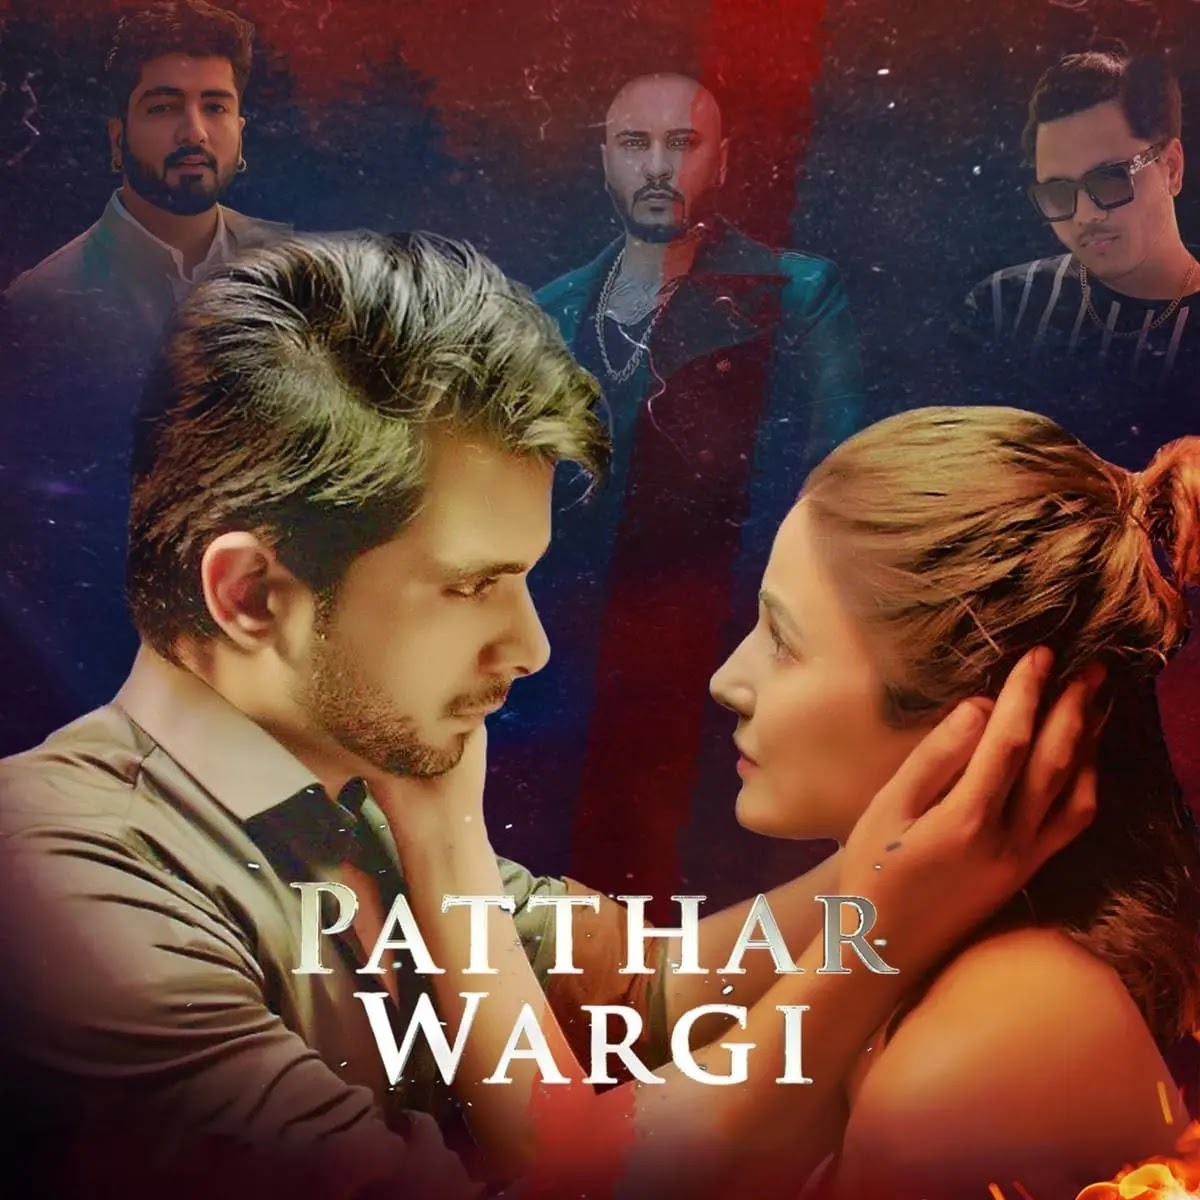 Patthar Wargi Jaani Song Download MP3 320kbps